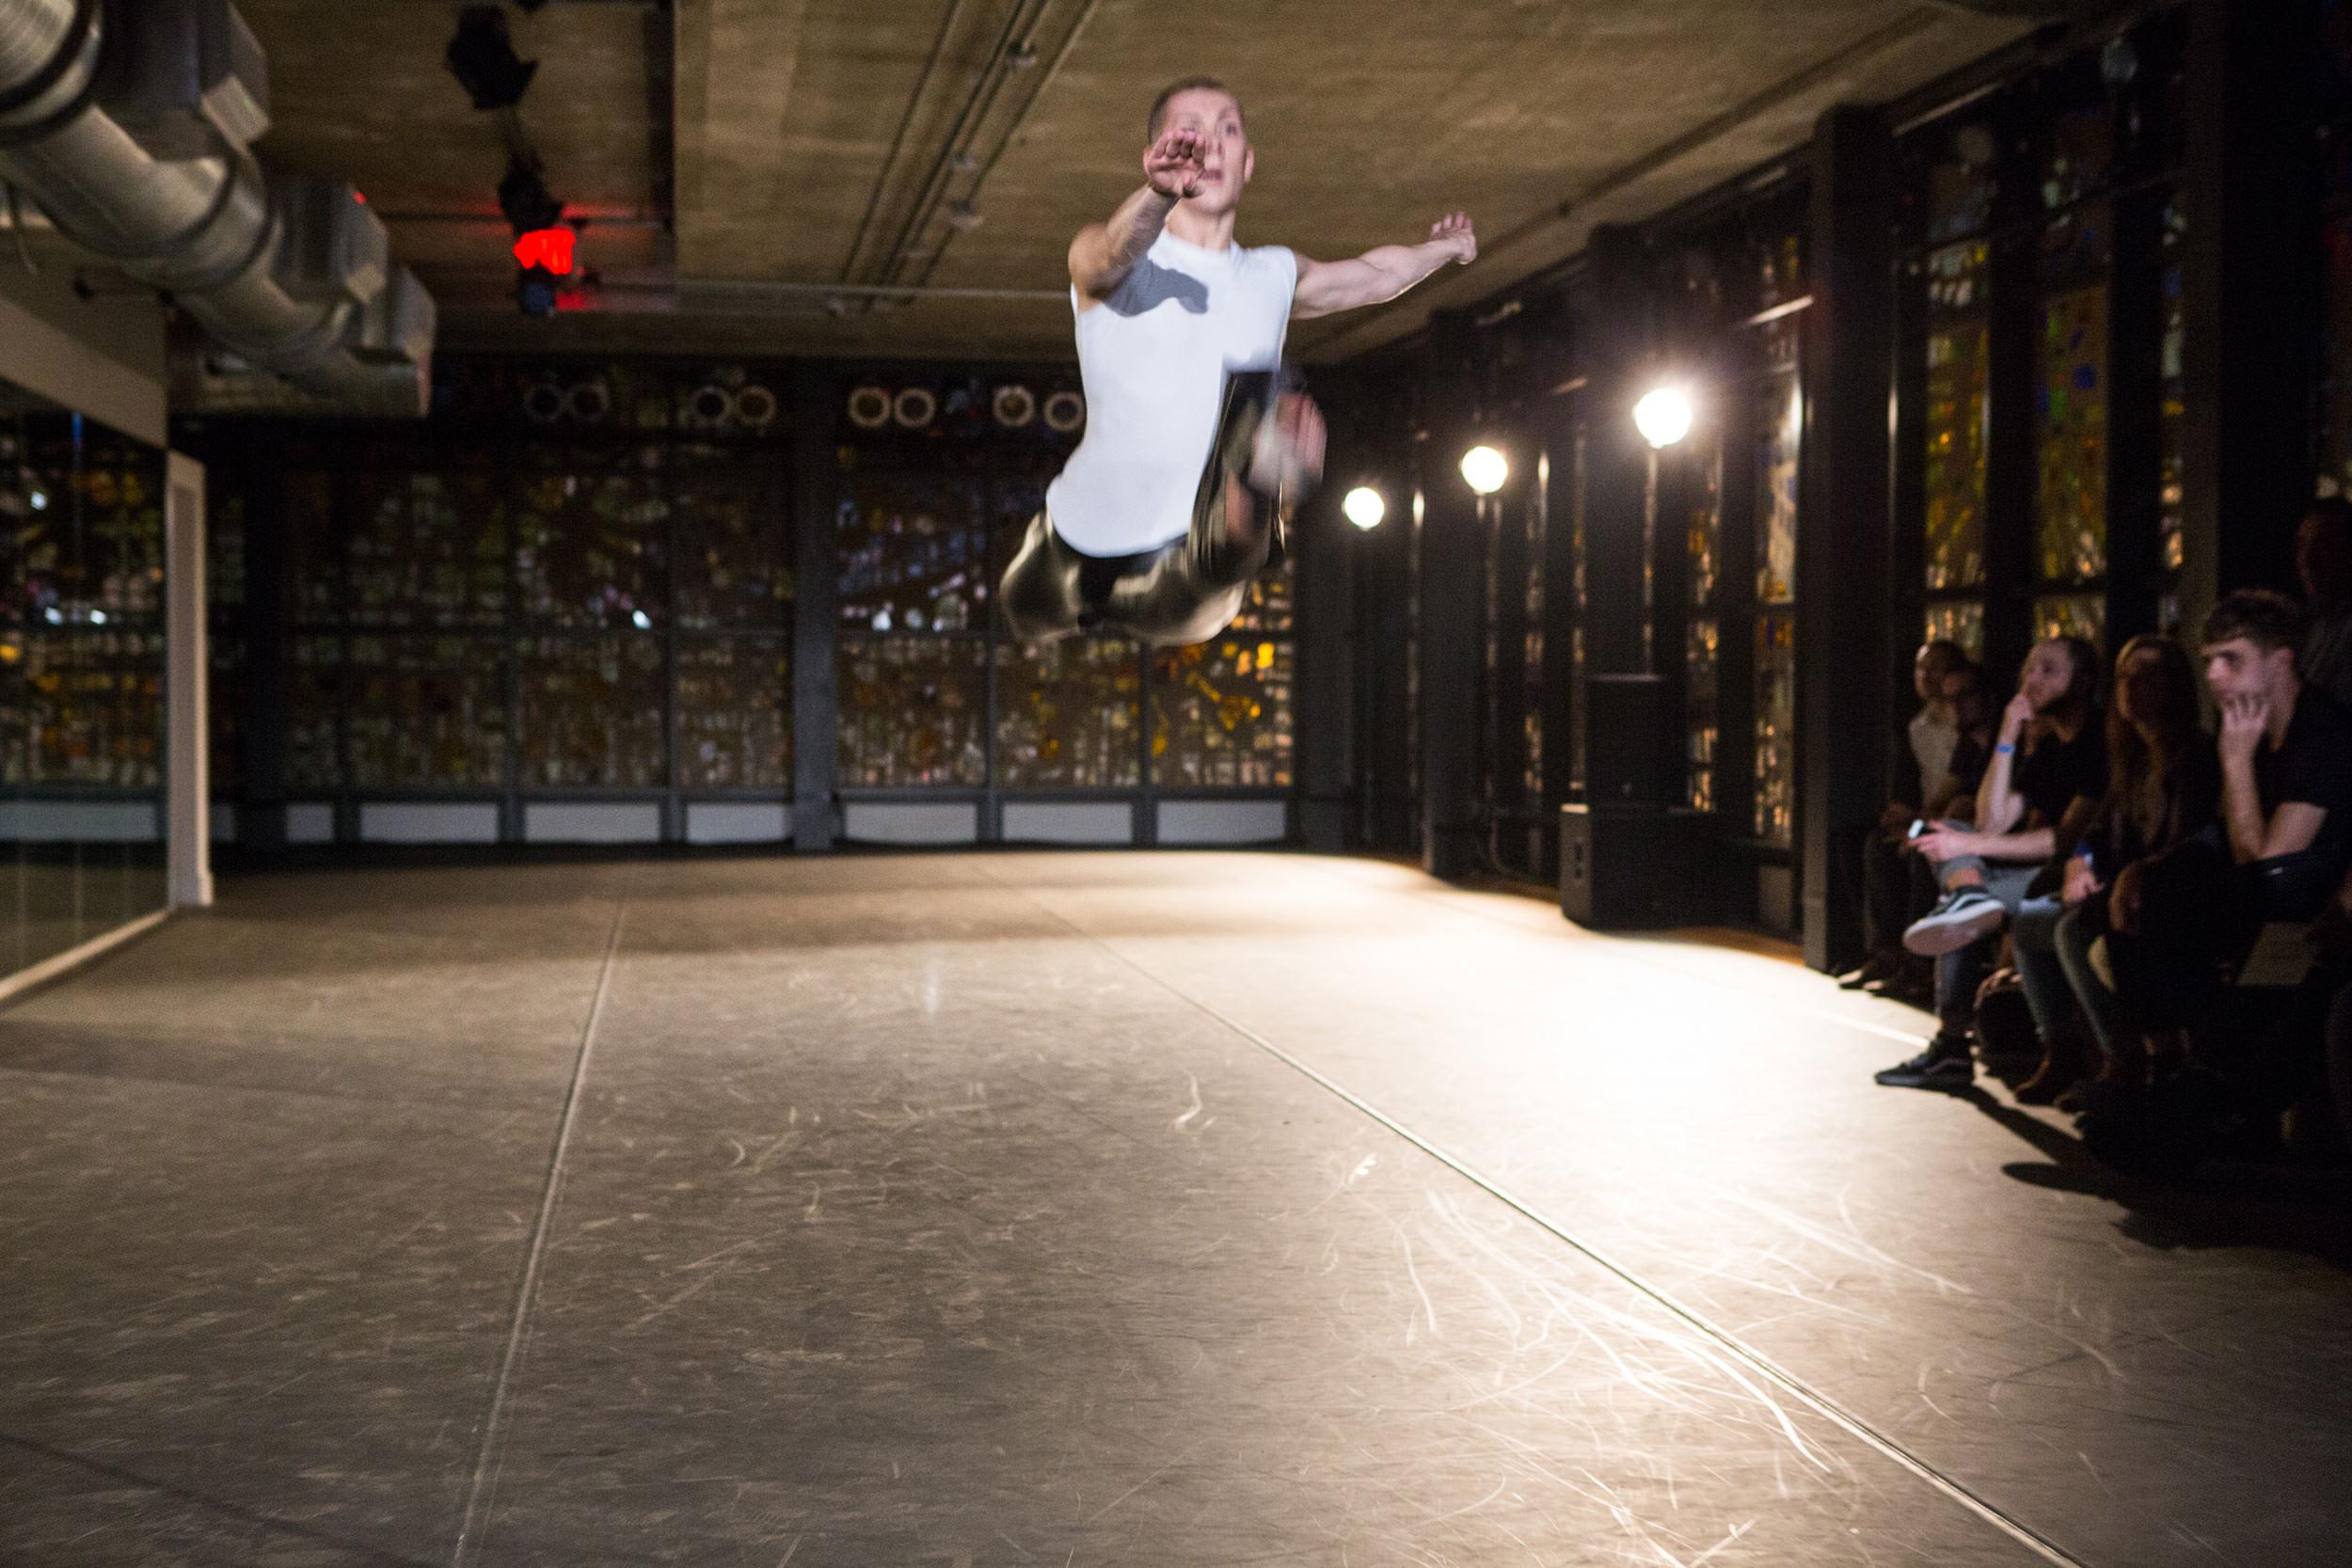 Jordan James Bridge. ICA Performs: Michael Clark Company. Photo: Sonja Garnitschnig.